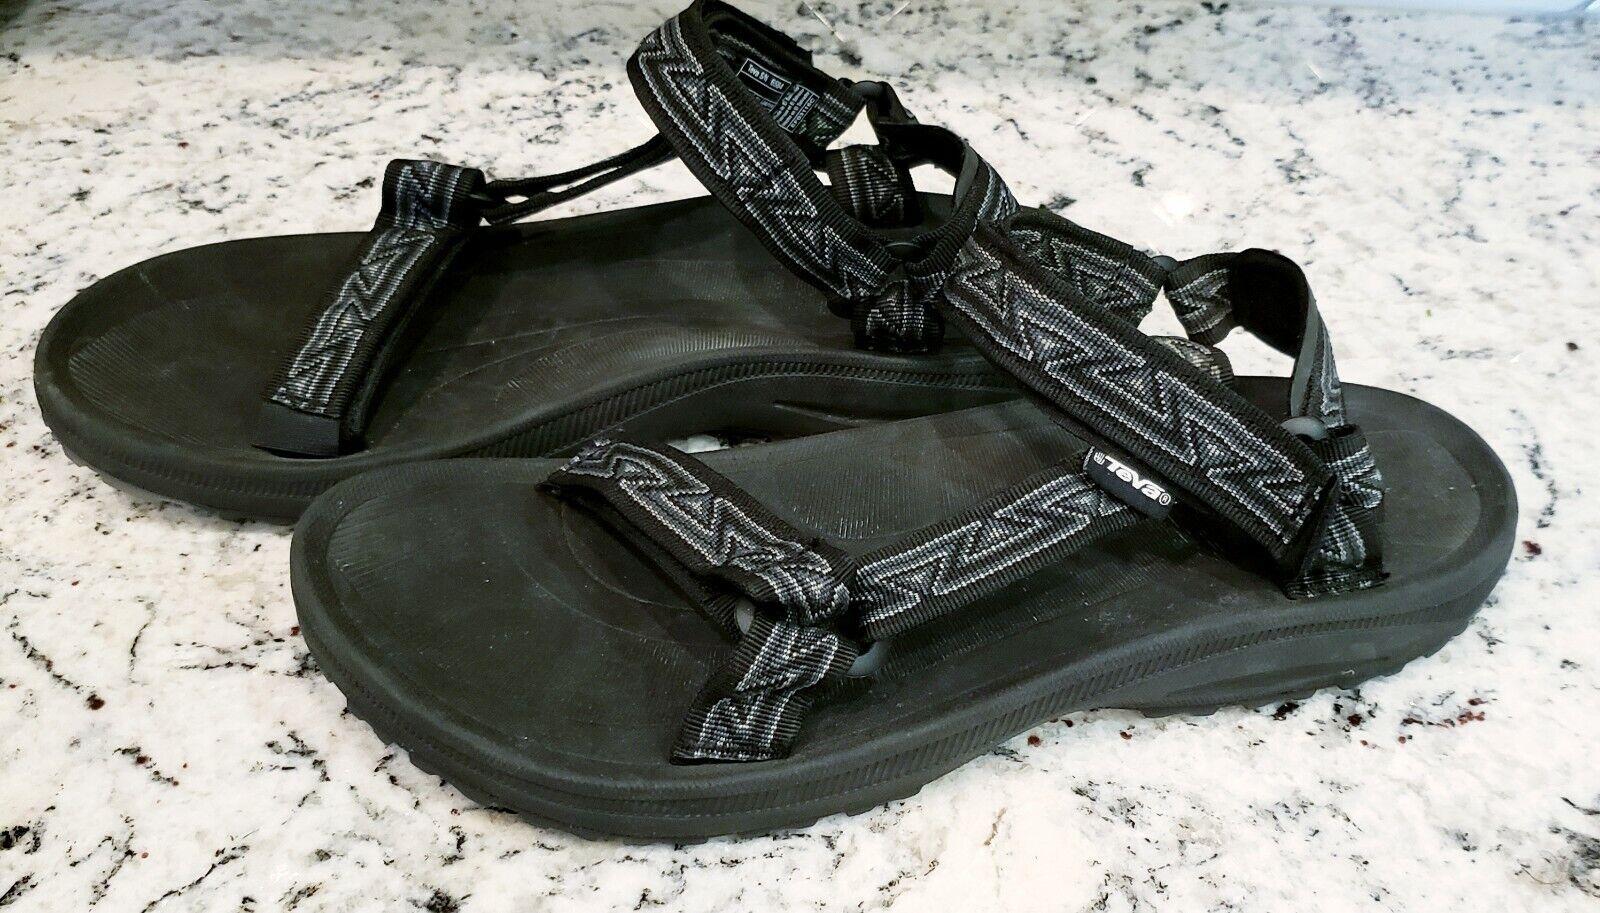 Teva 6584 Black Adjustable Sport Hiking Water River Sandal Shoes Mens 13